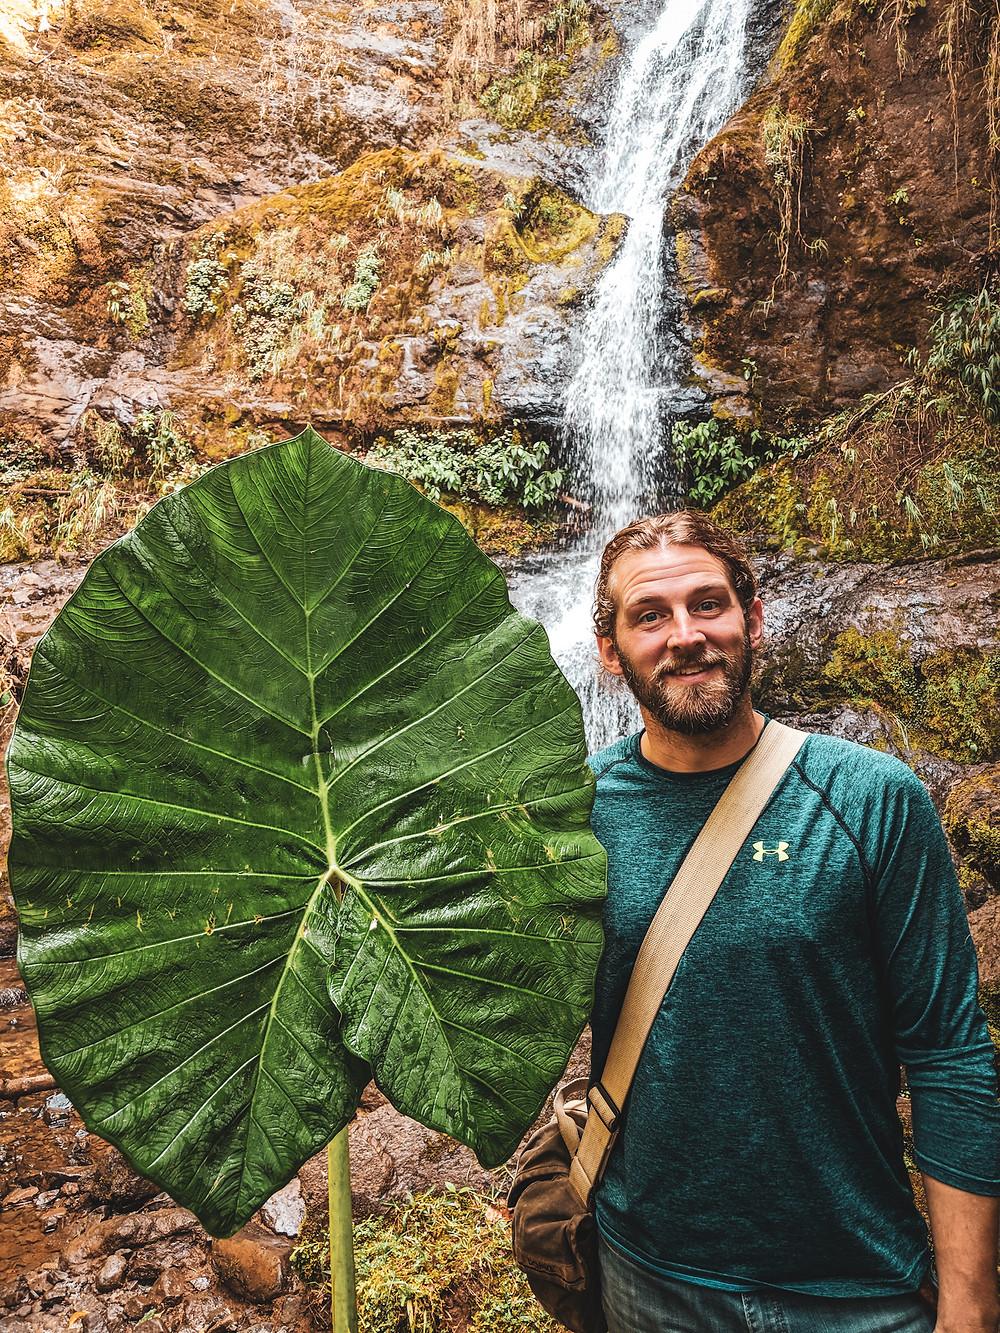 Giant leaf in Jardin, Colombia.